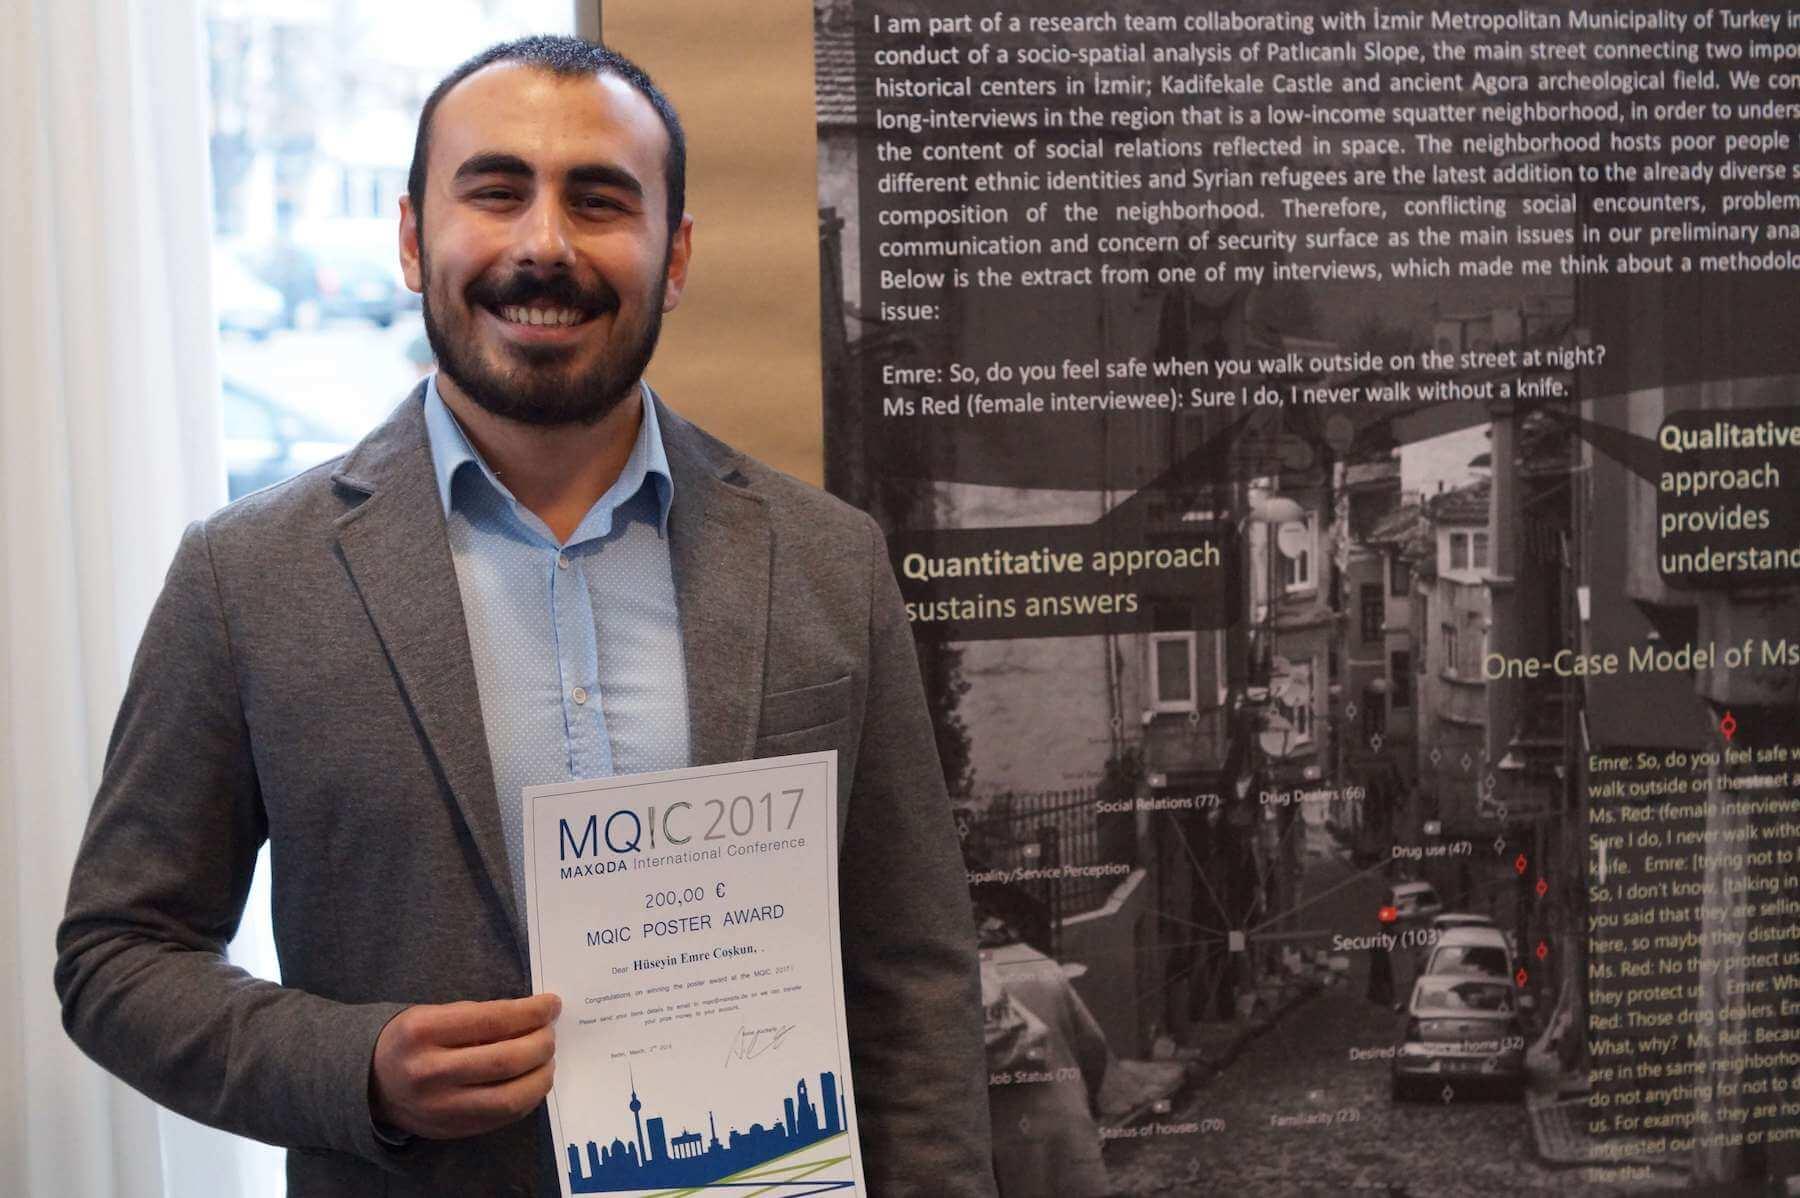 Qualitative research conference MQIC